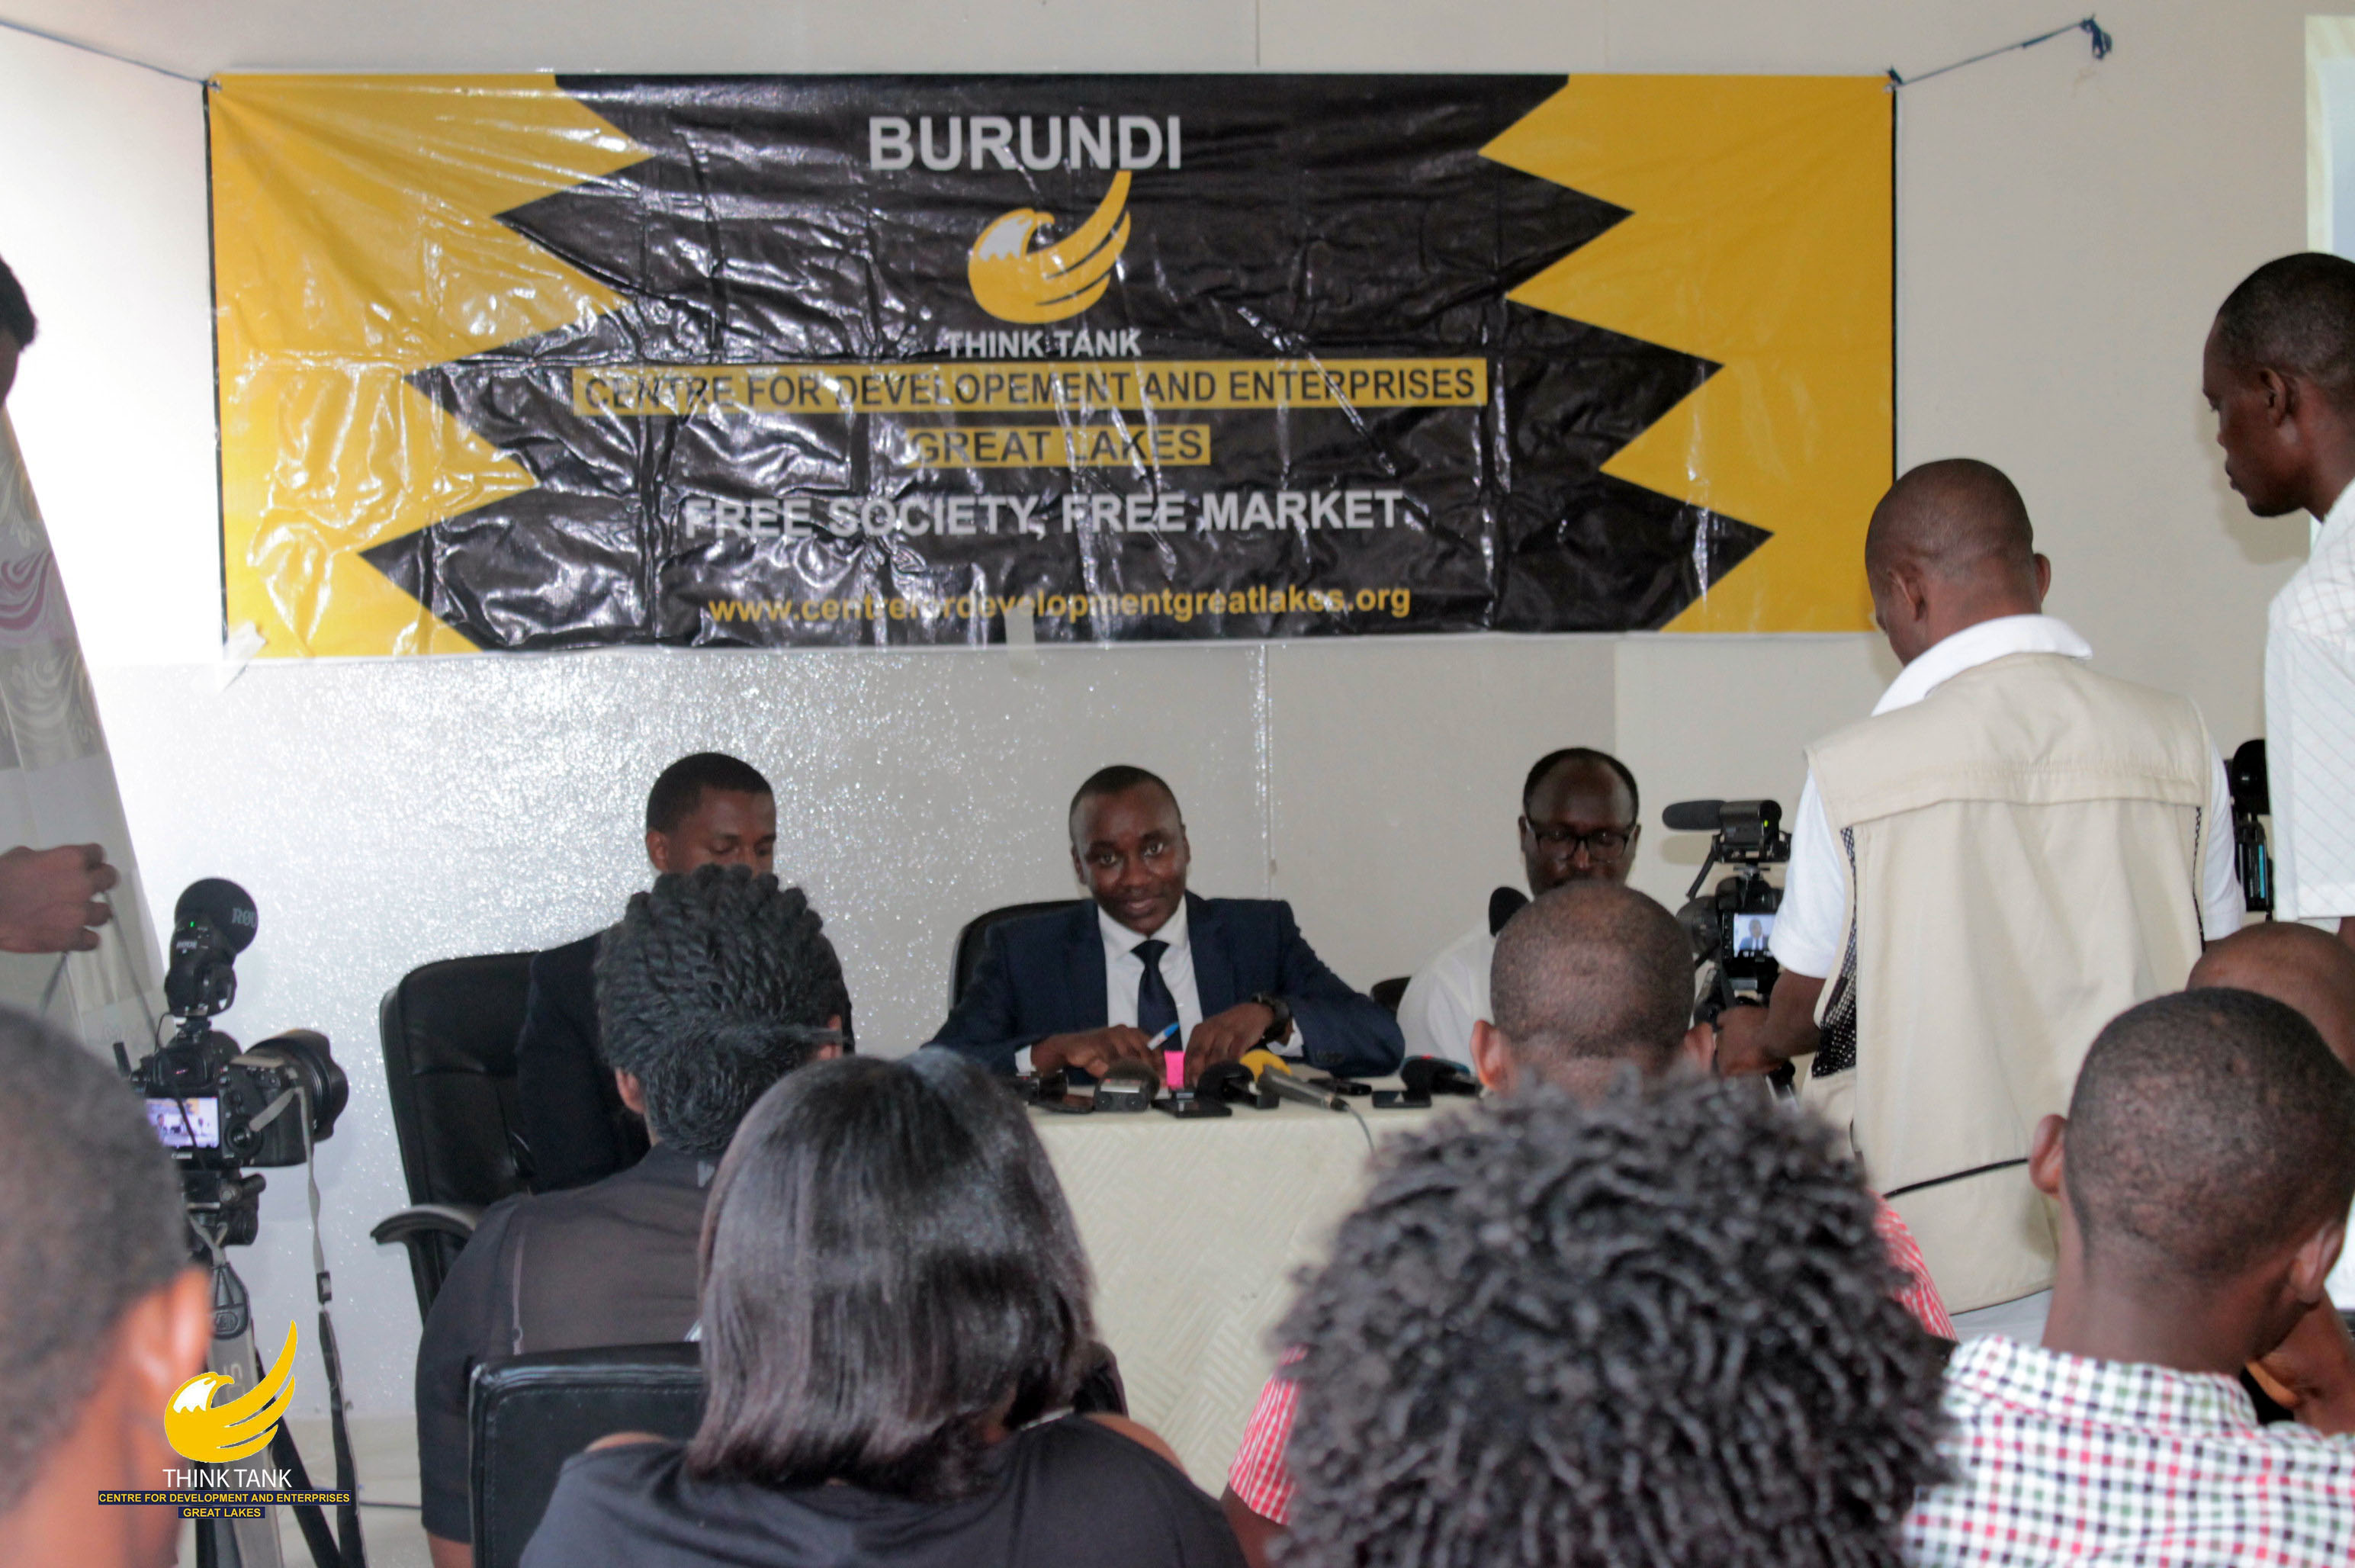 La campagne « Birashoboka », levier de l'économie burundaise